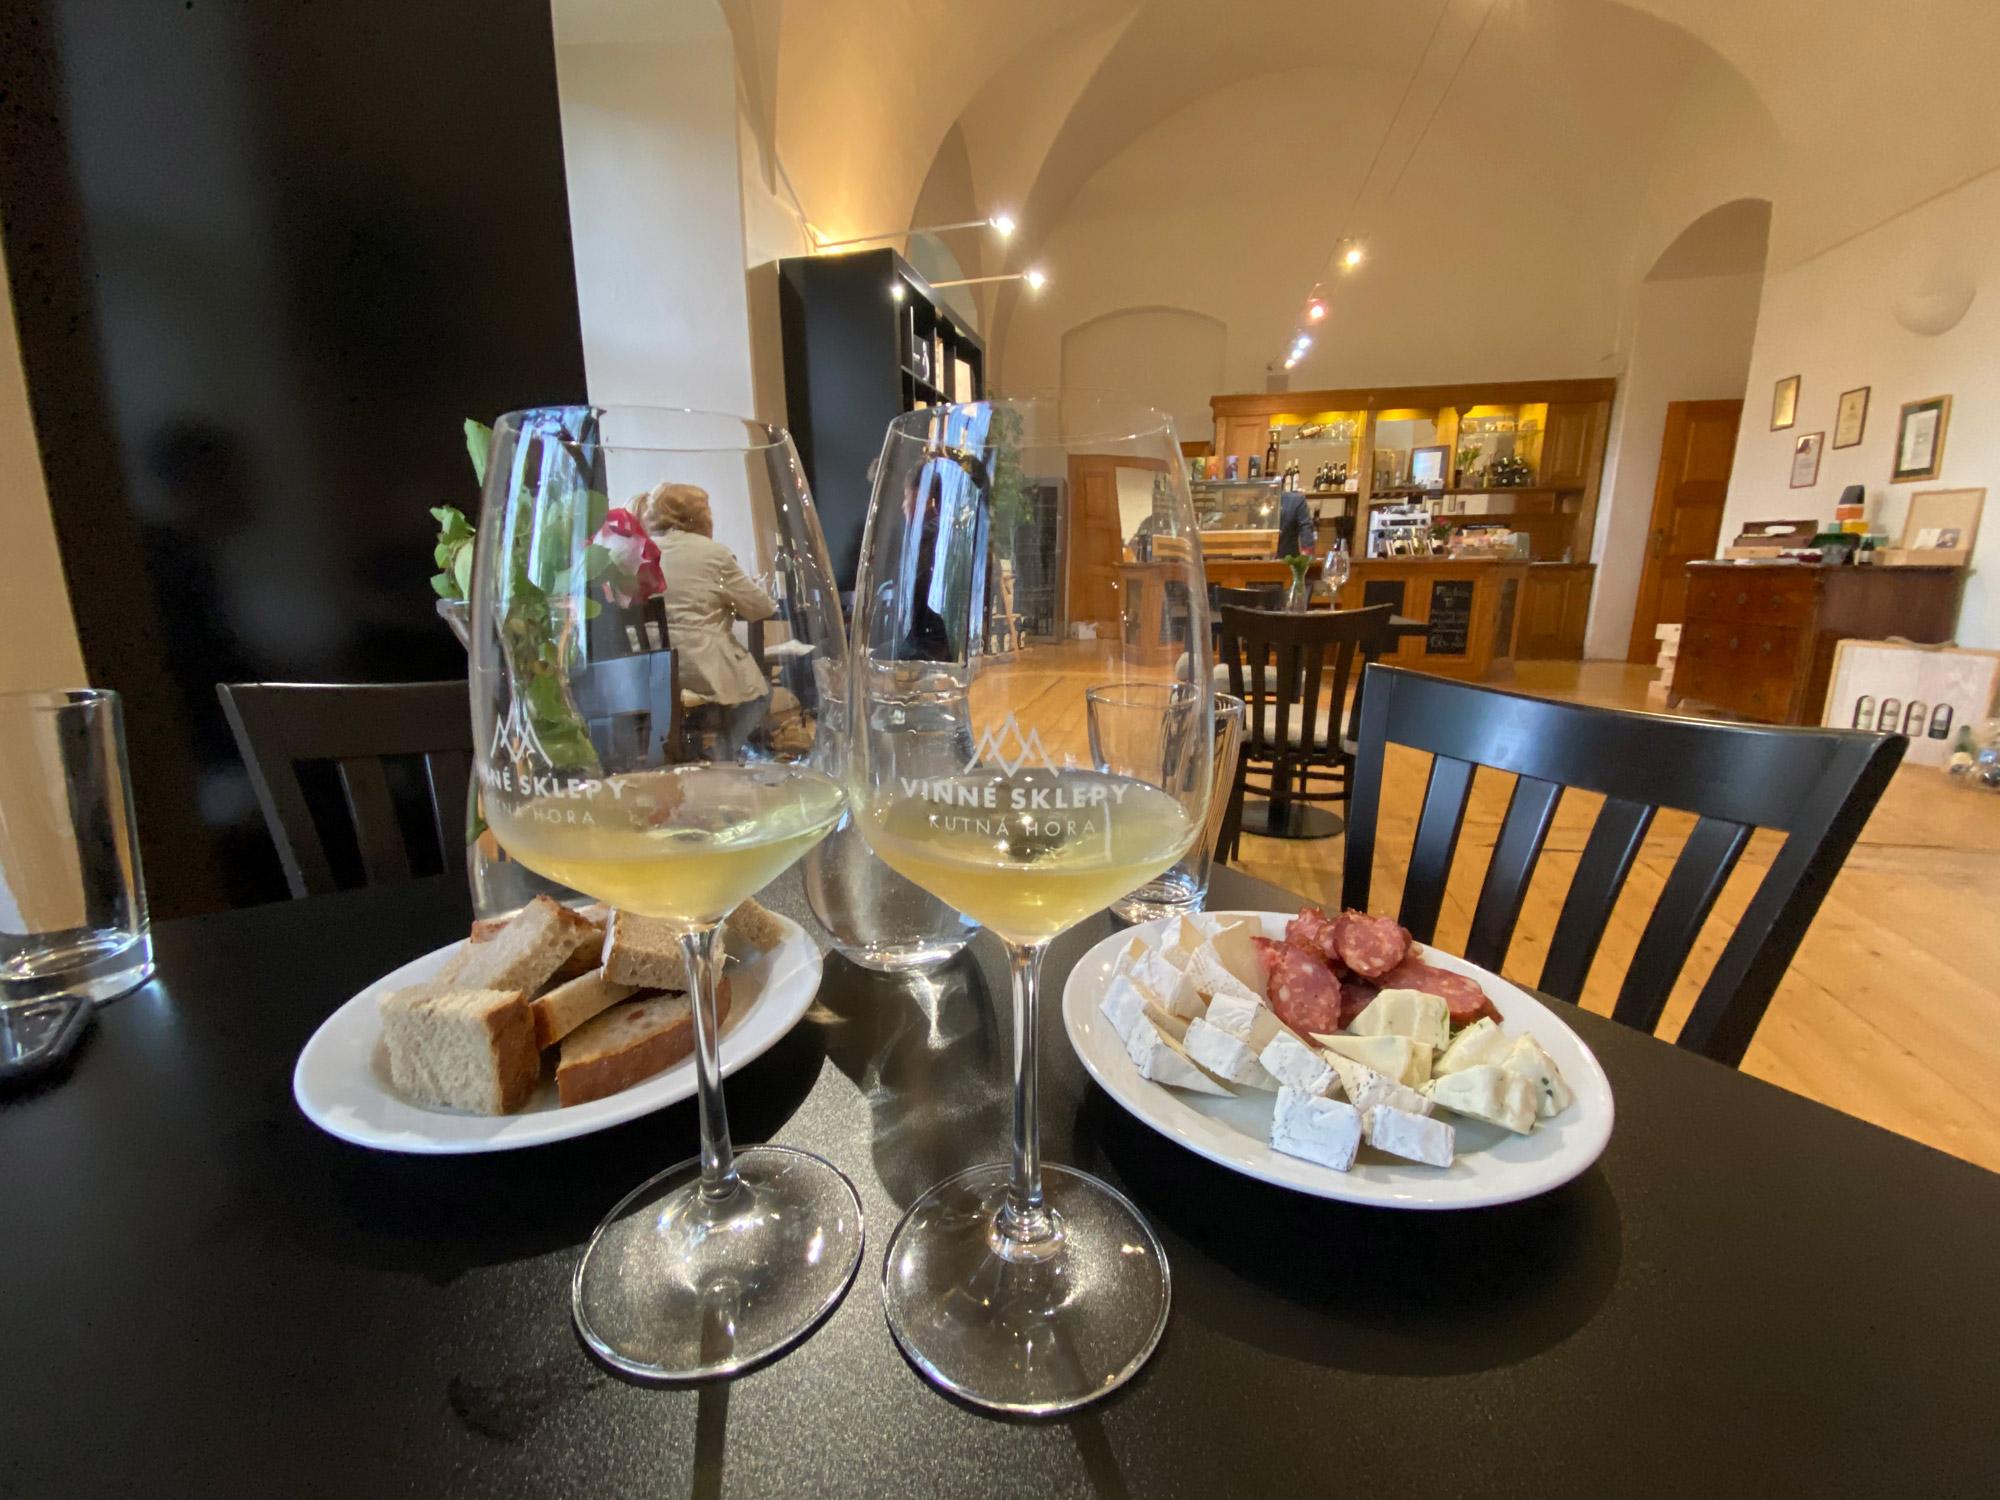 Tsjechië reis - dag 14 - Wijnproeverij in Kutna Hora